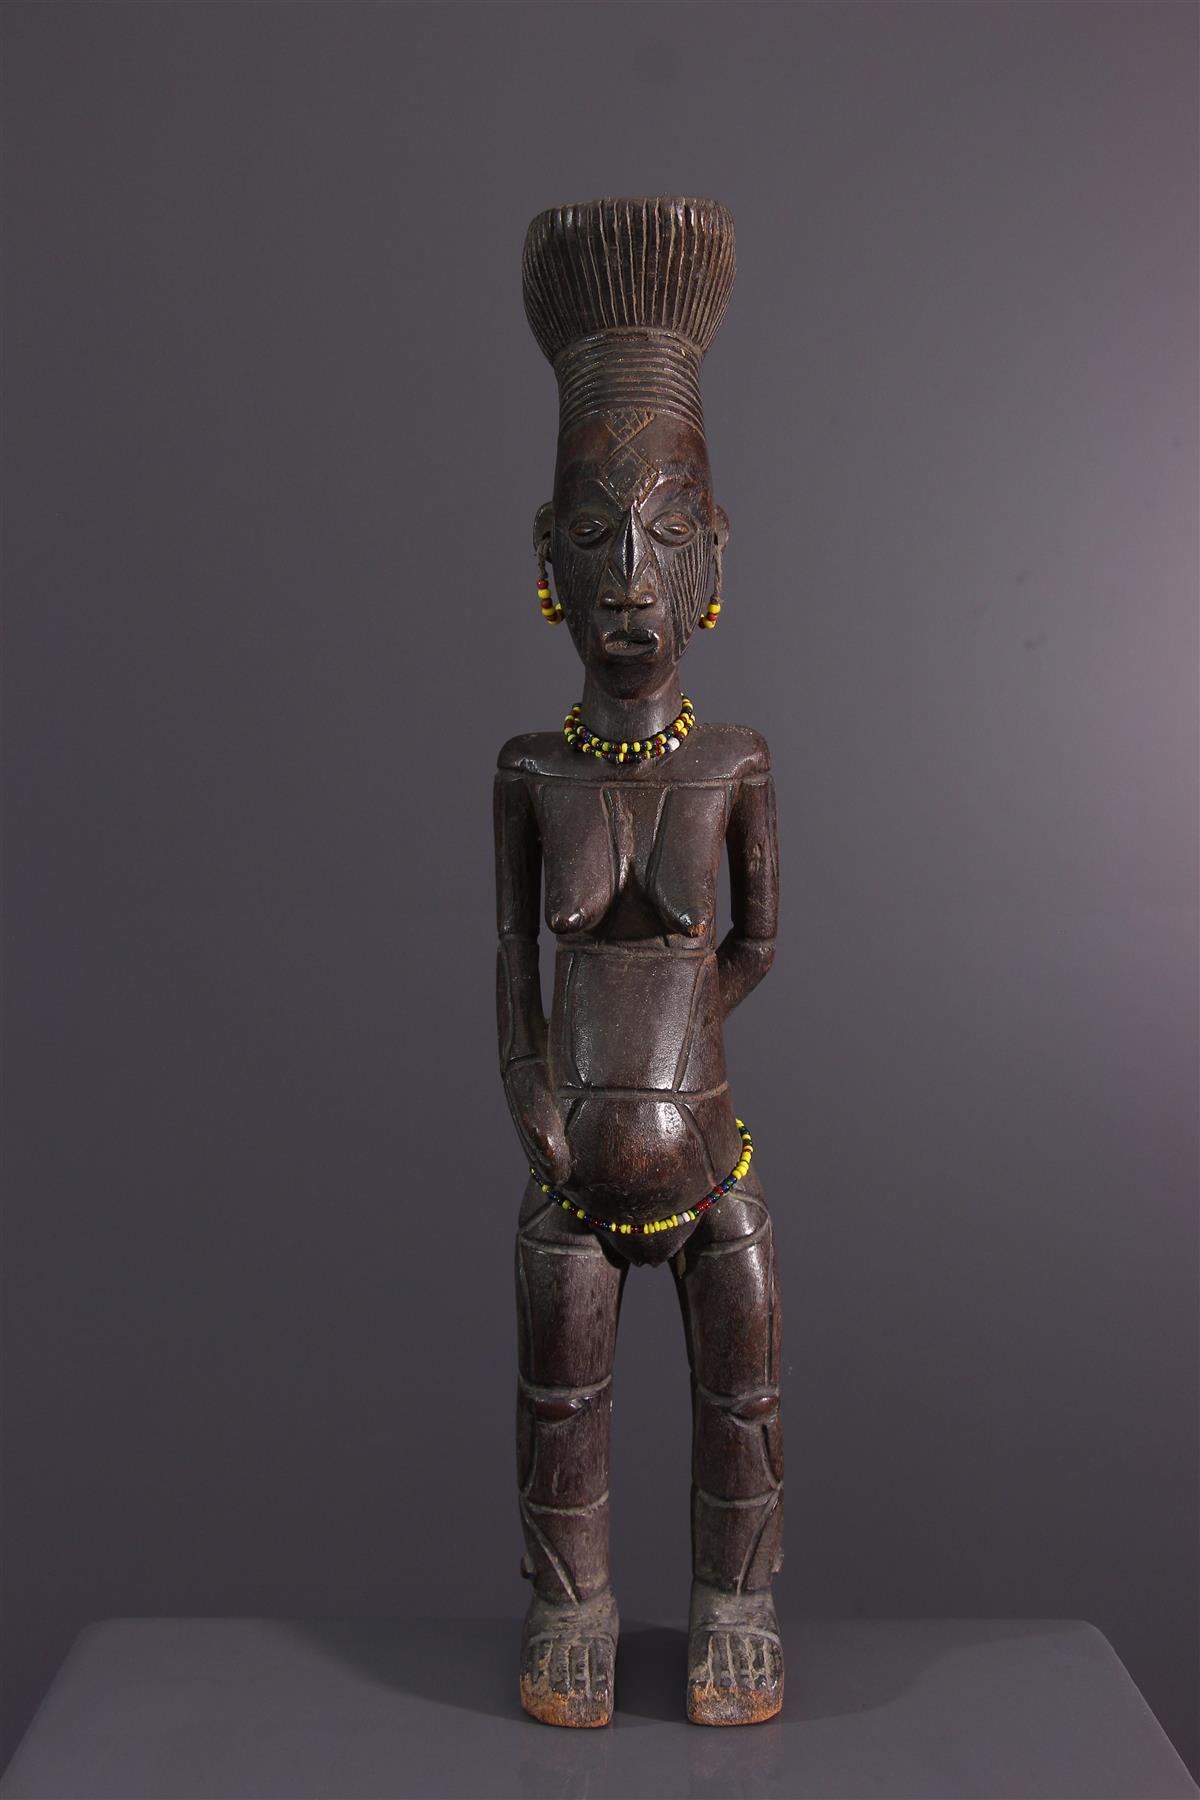 Statuette Mangbetu - Art africain